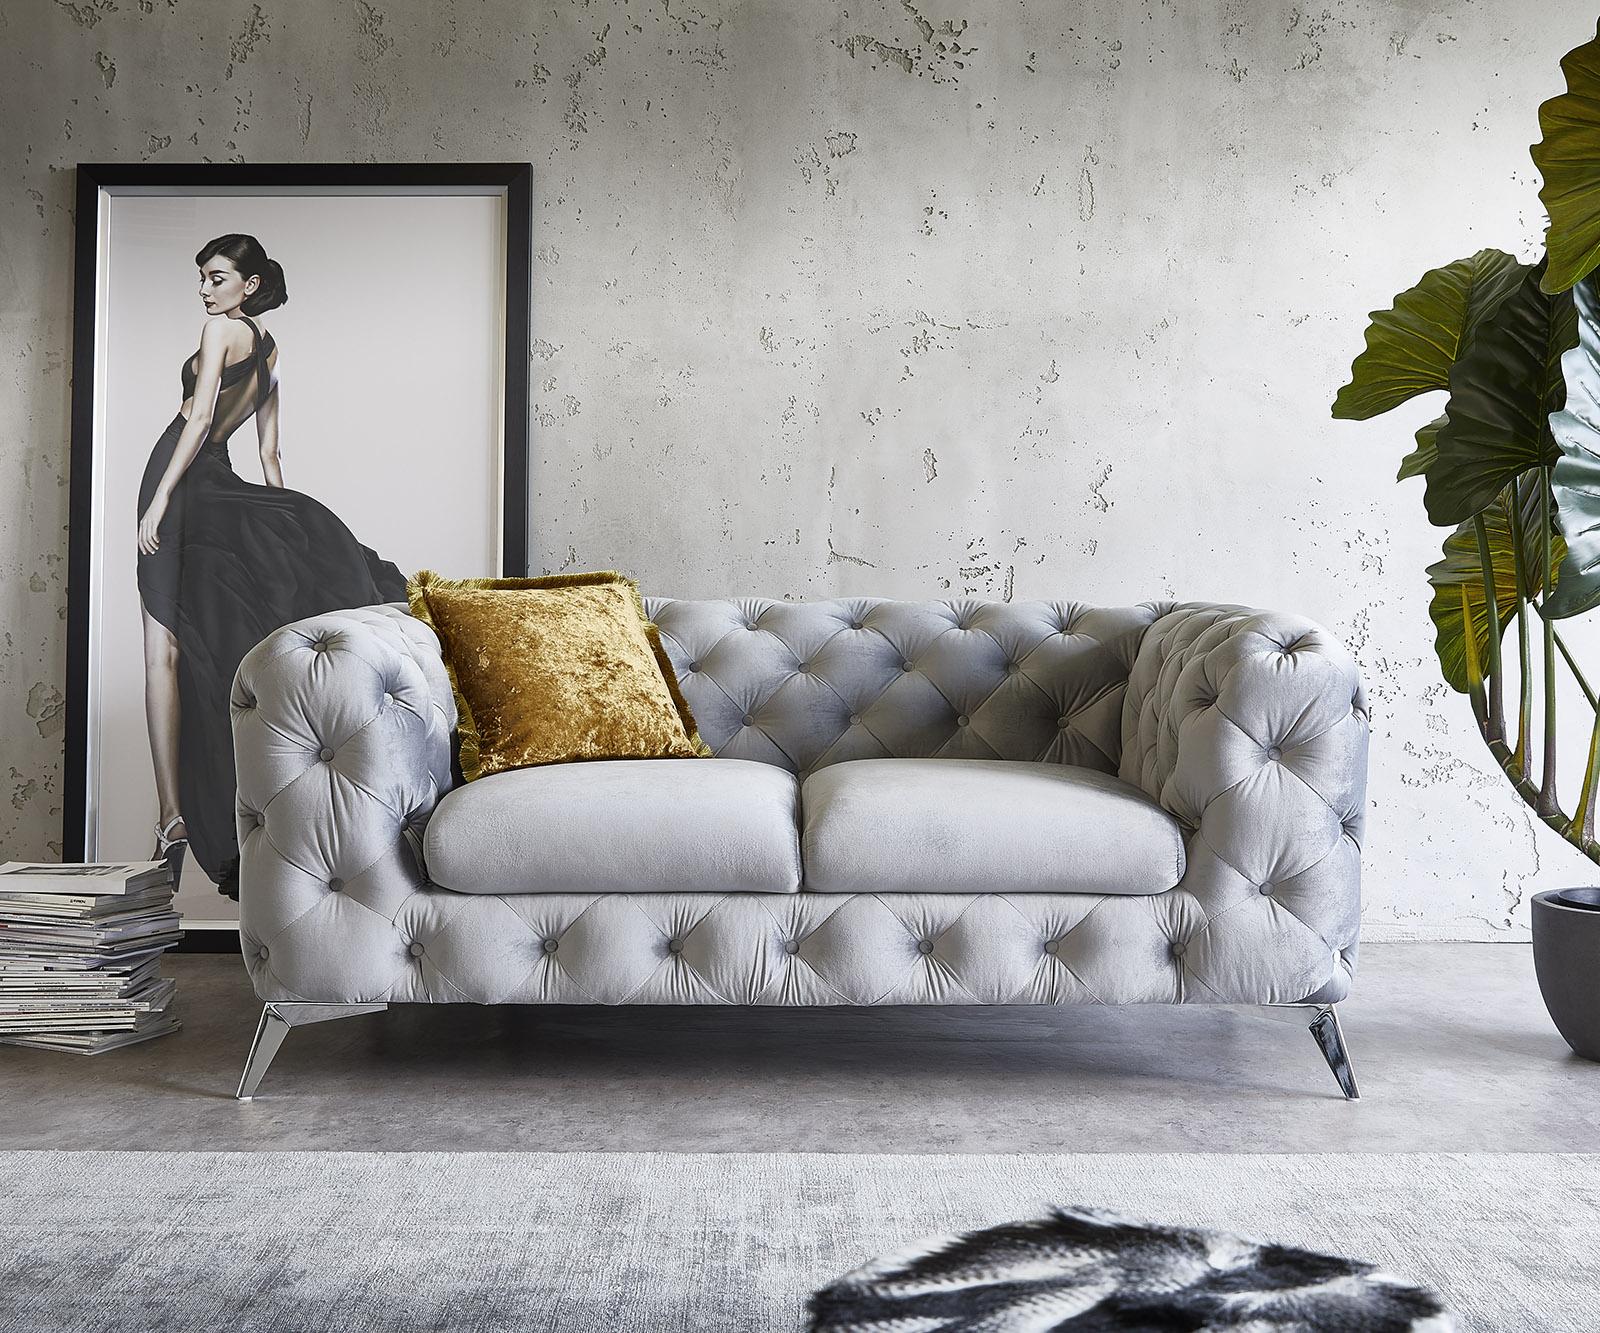 Couch Corleone  185x97 cm Grau Samt Chrome 2-Sitzer Sofa